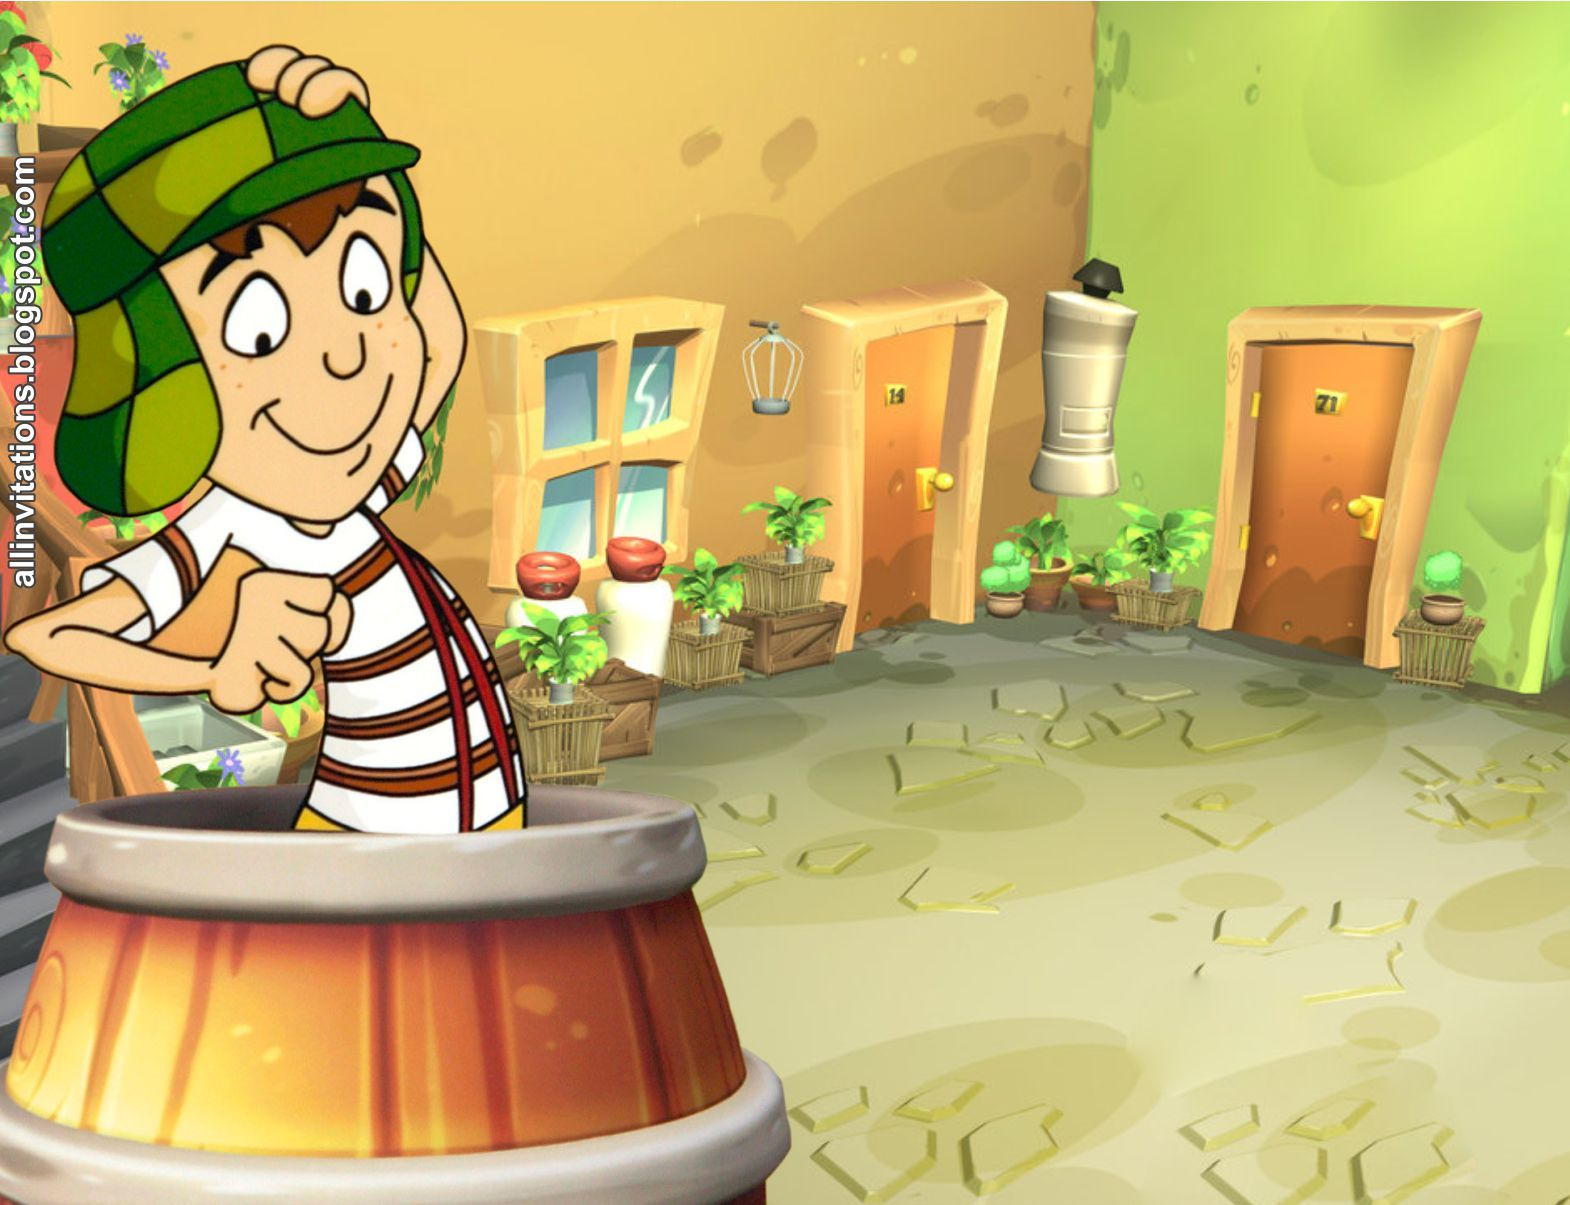 Planttilla Invitacion Chavo Del 8 Animado Invitaciones